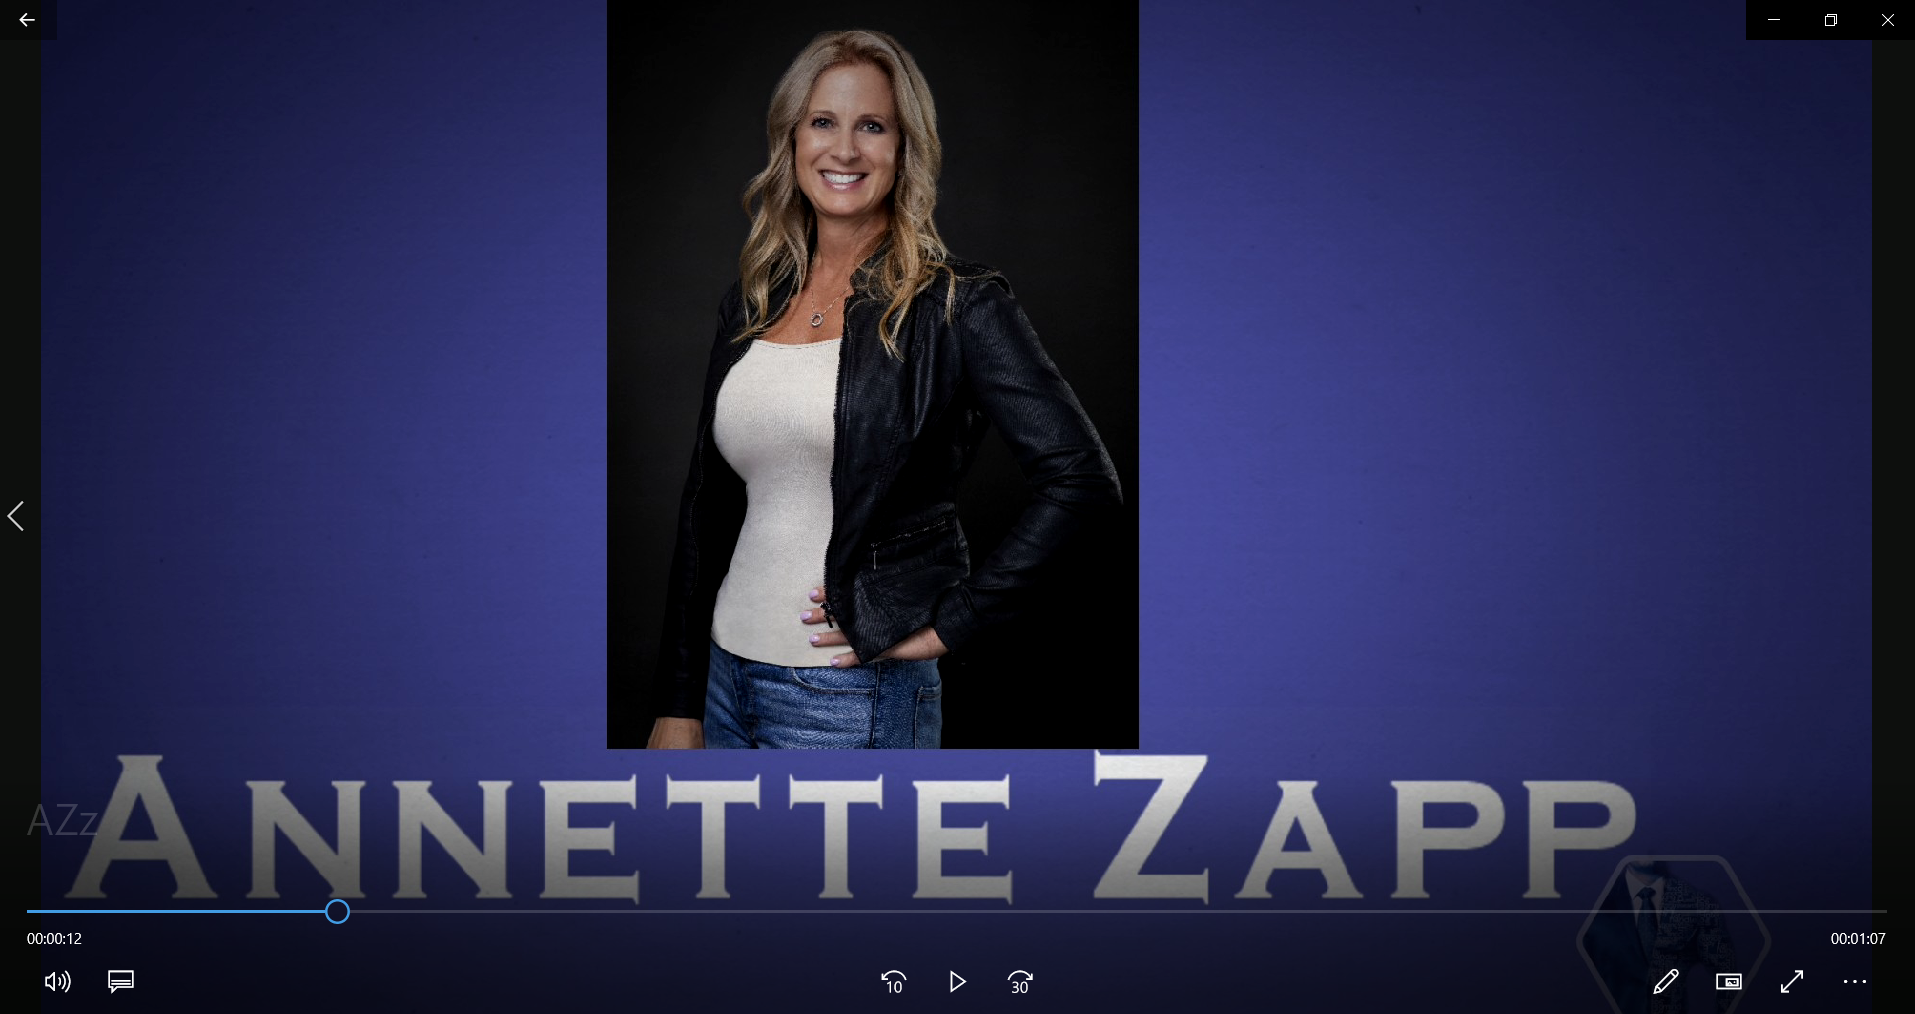 People that inspire KC-performance, vol. 4: Lt. Annette Zapp, MA